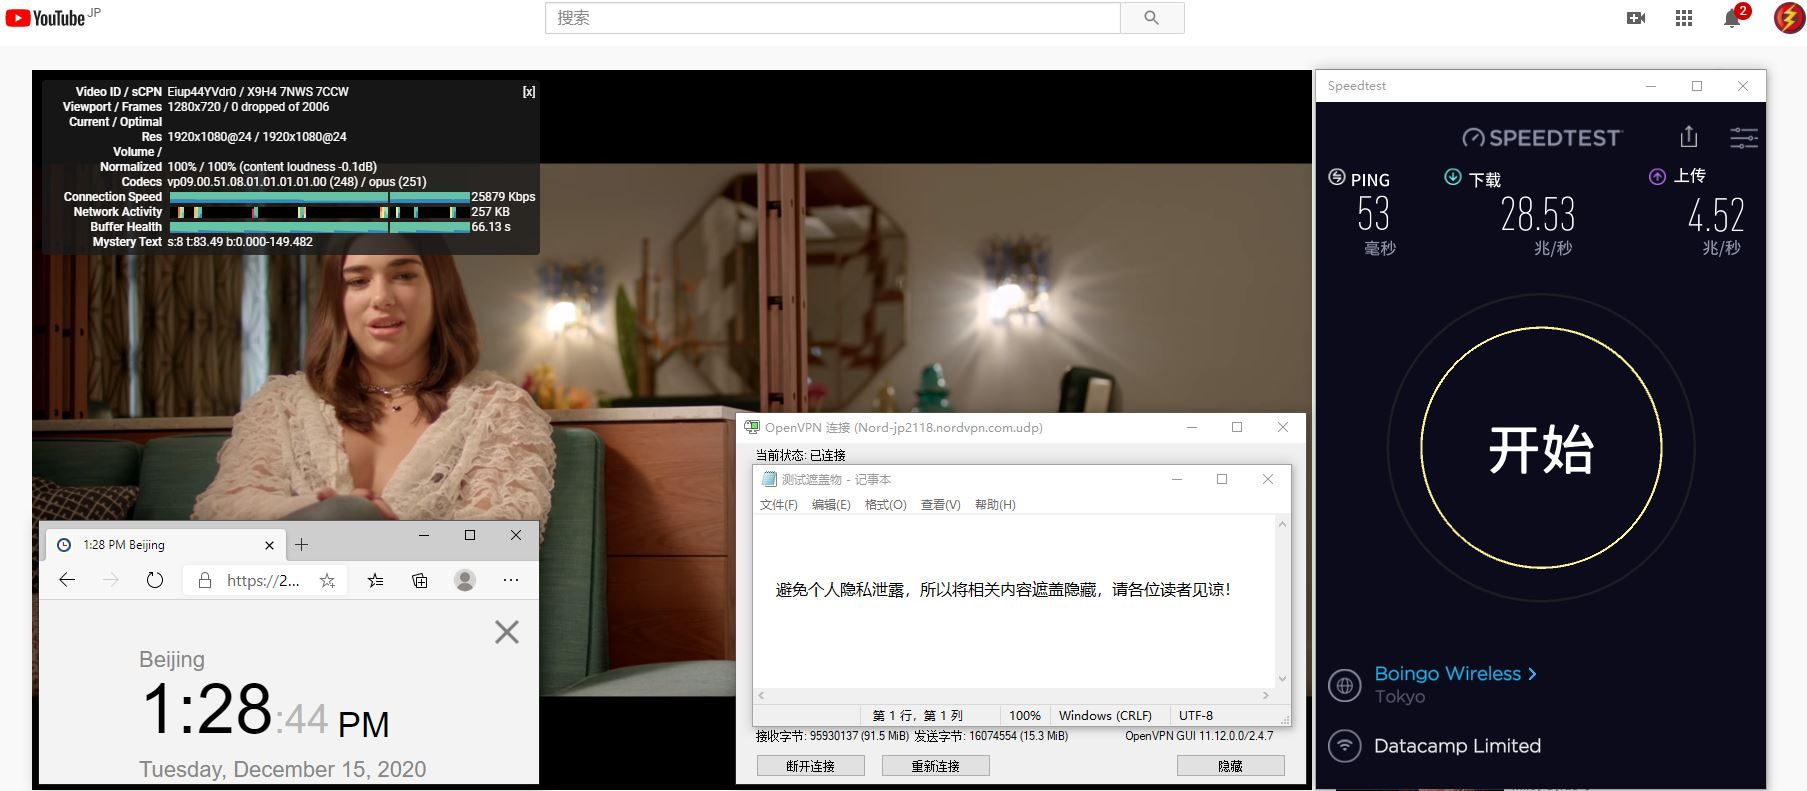 Windows10 NordVPN OpenVPN Gui JP2118 服务器 中国VPN 翻墙 科学上网 测试 - 20201215